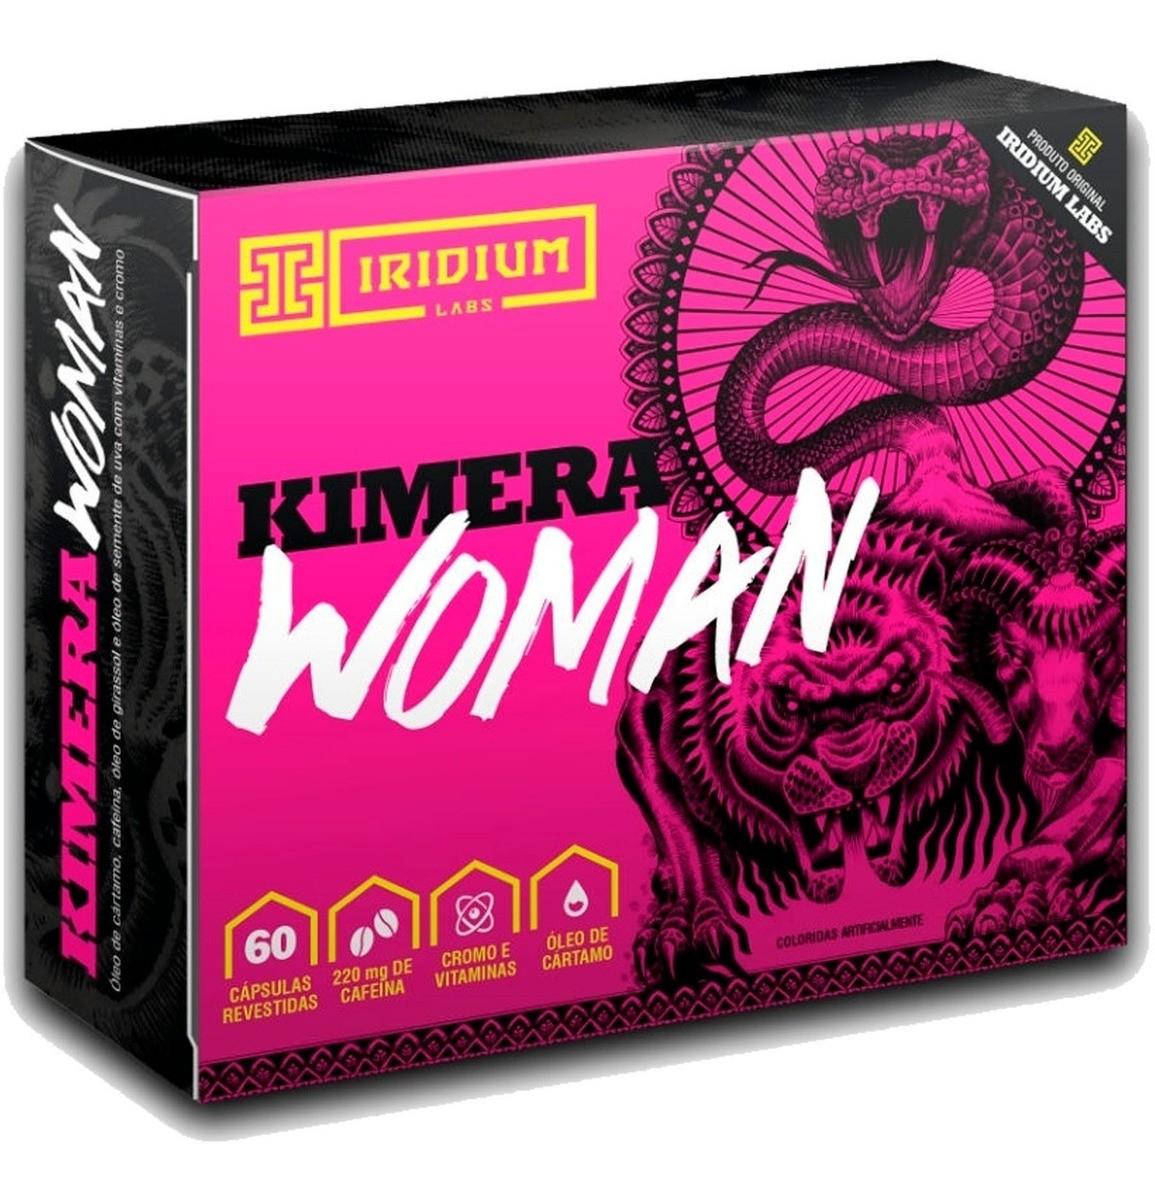 Imagem do produto KIMERA WOMAN 60 CAPS - IRIDIUM LABS